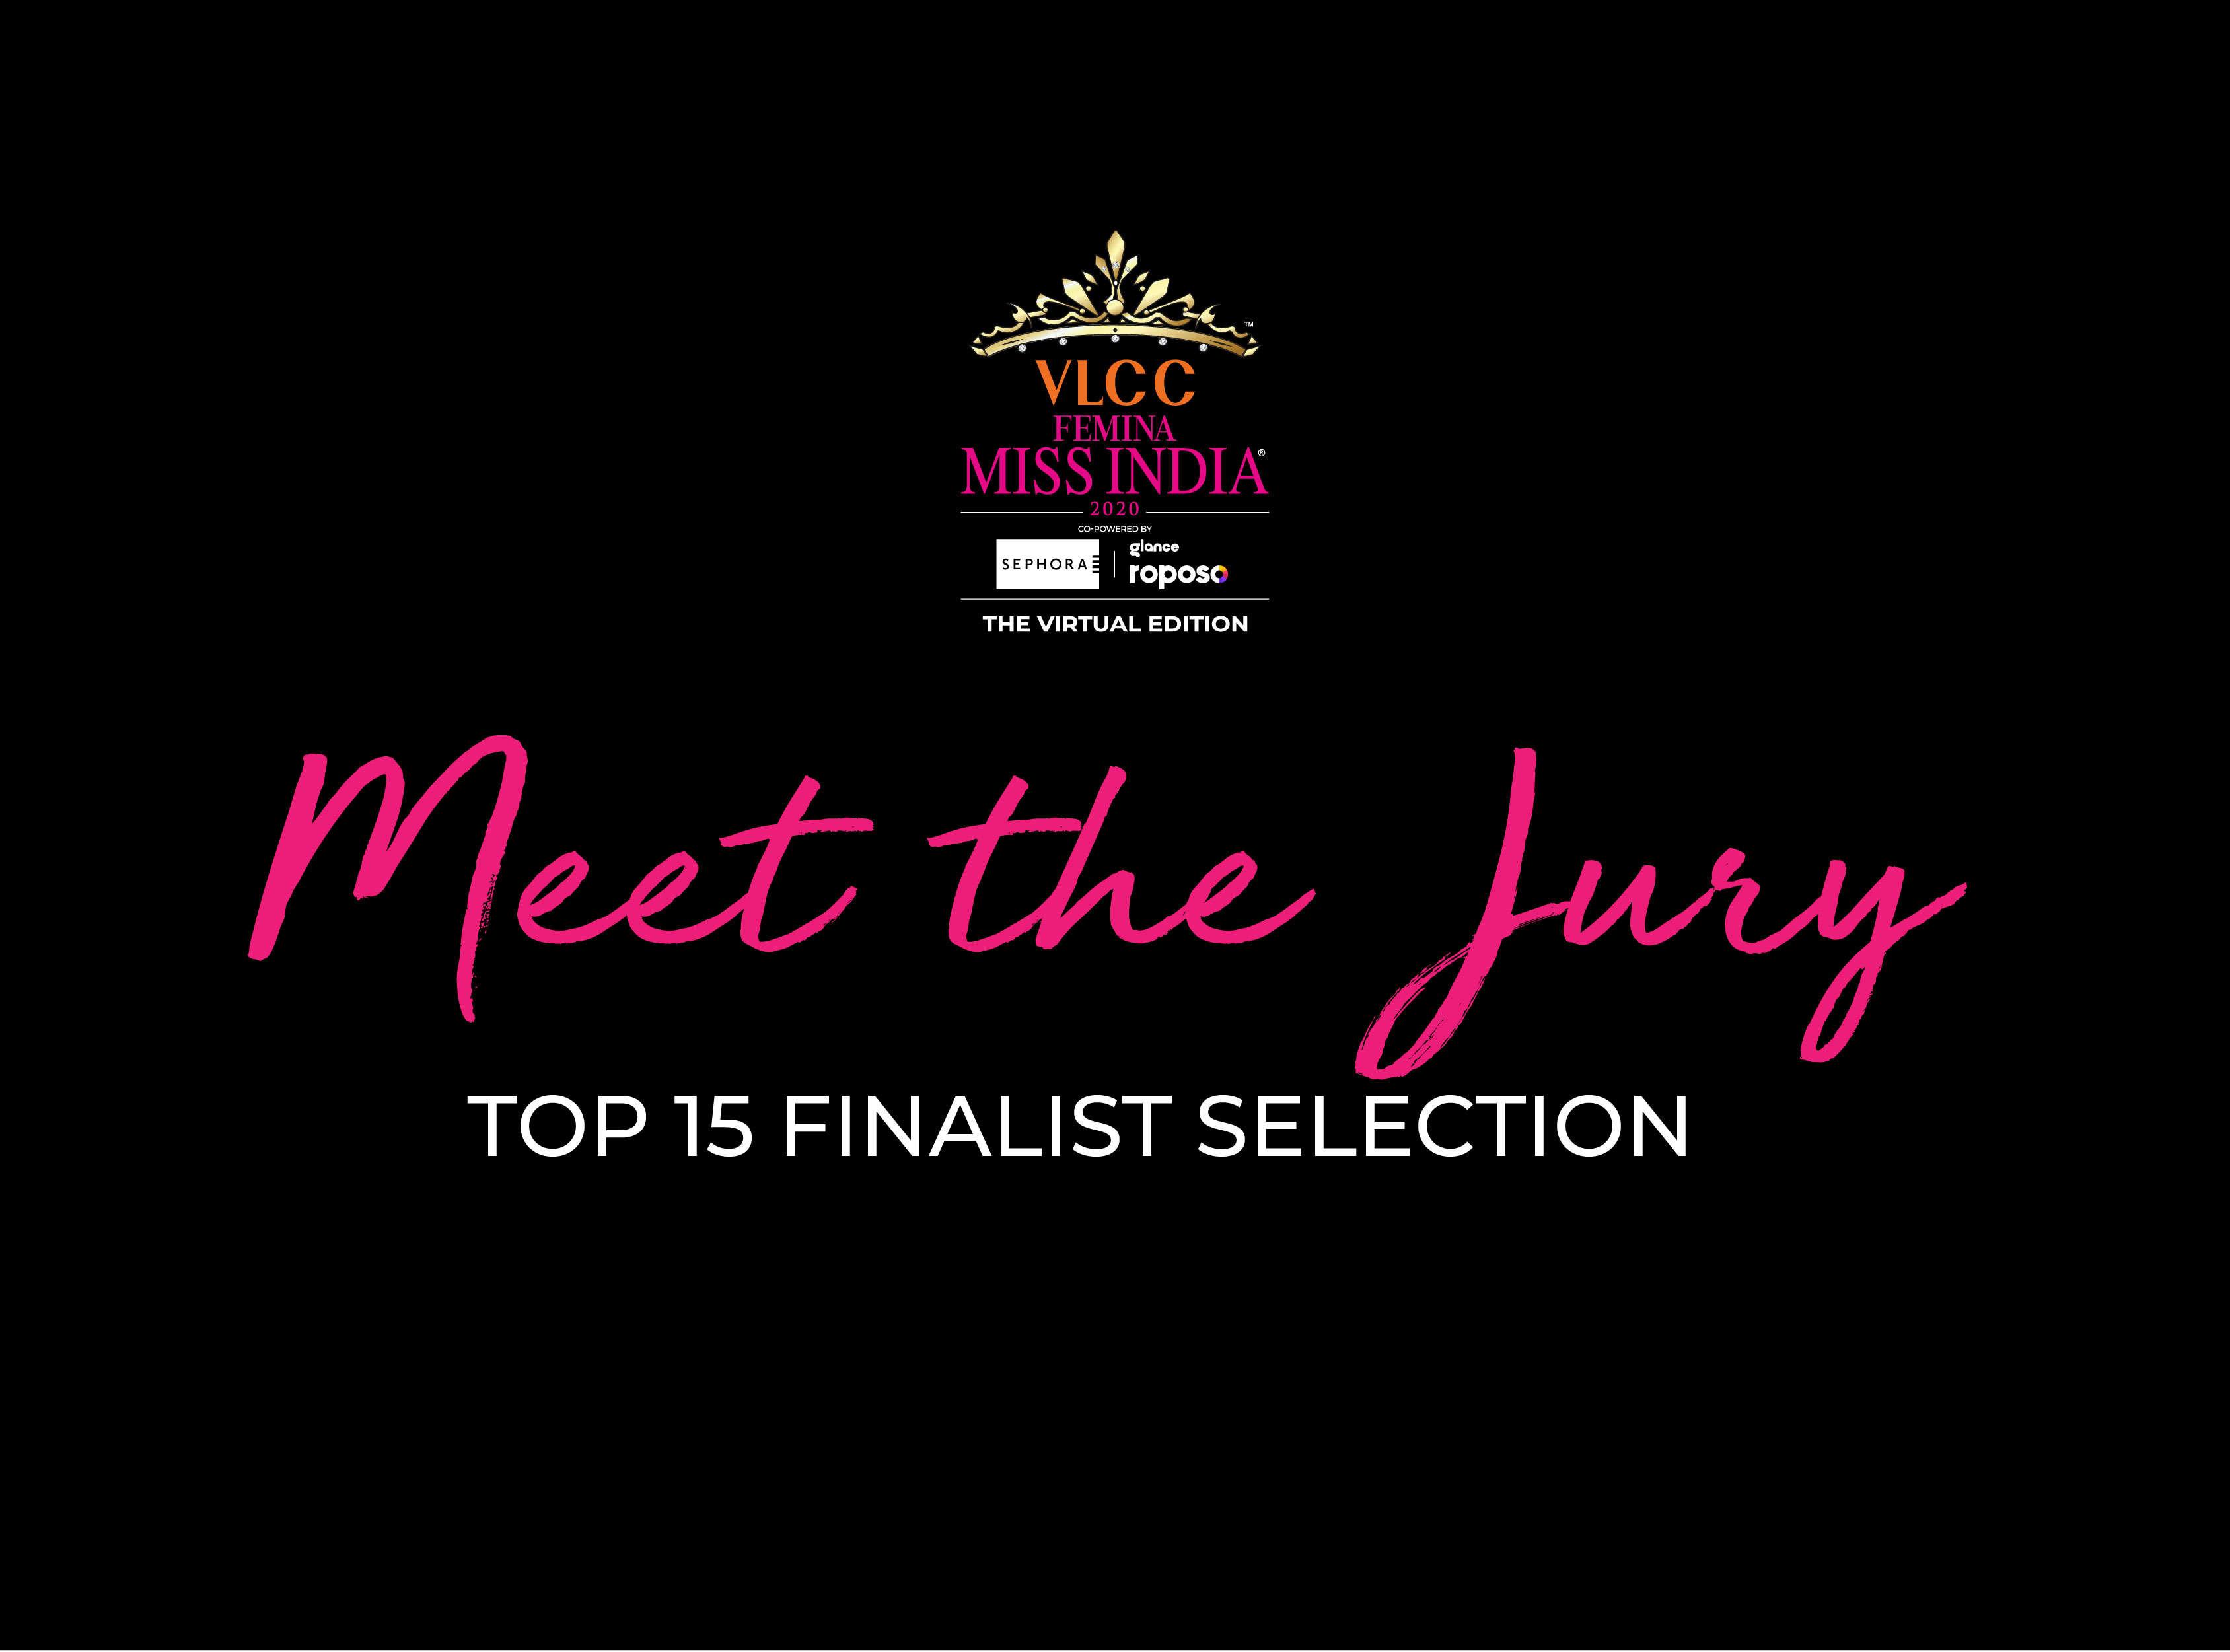 Meet the jury of Top 15 finalist selection at VLCC Femina Miss India 2020